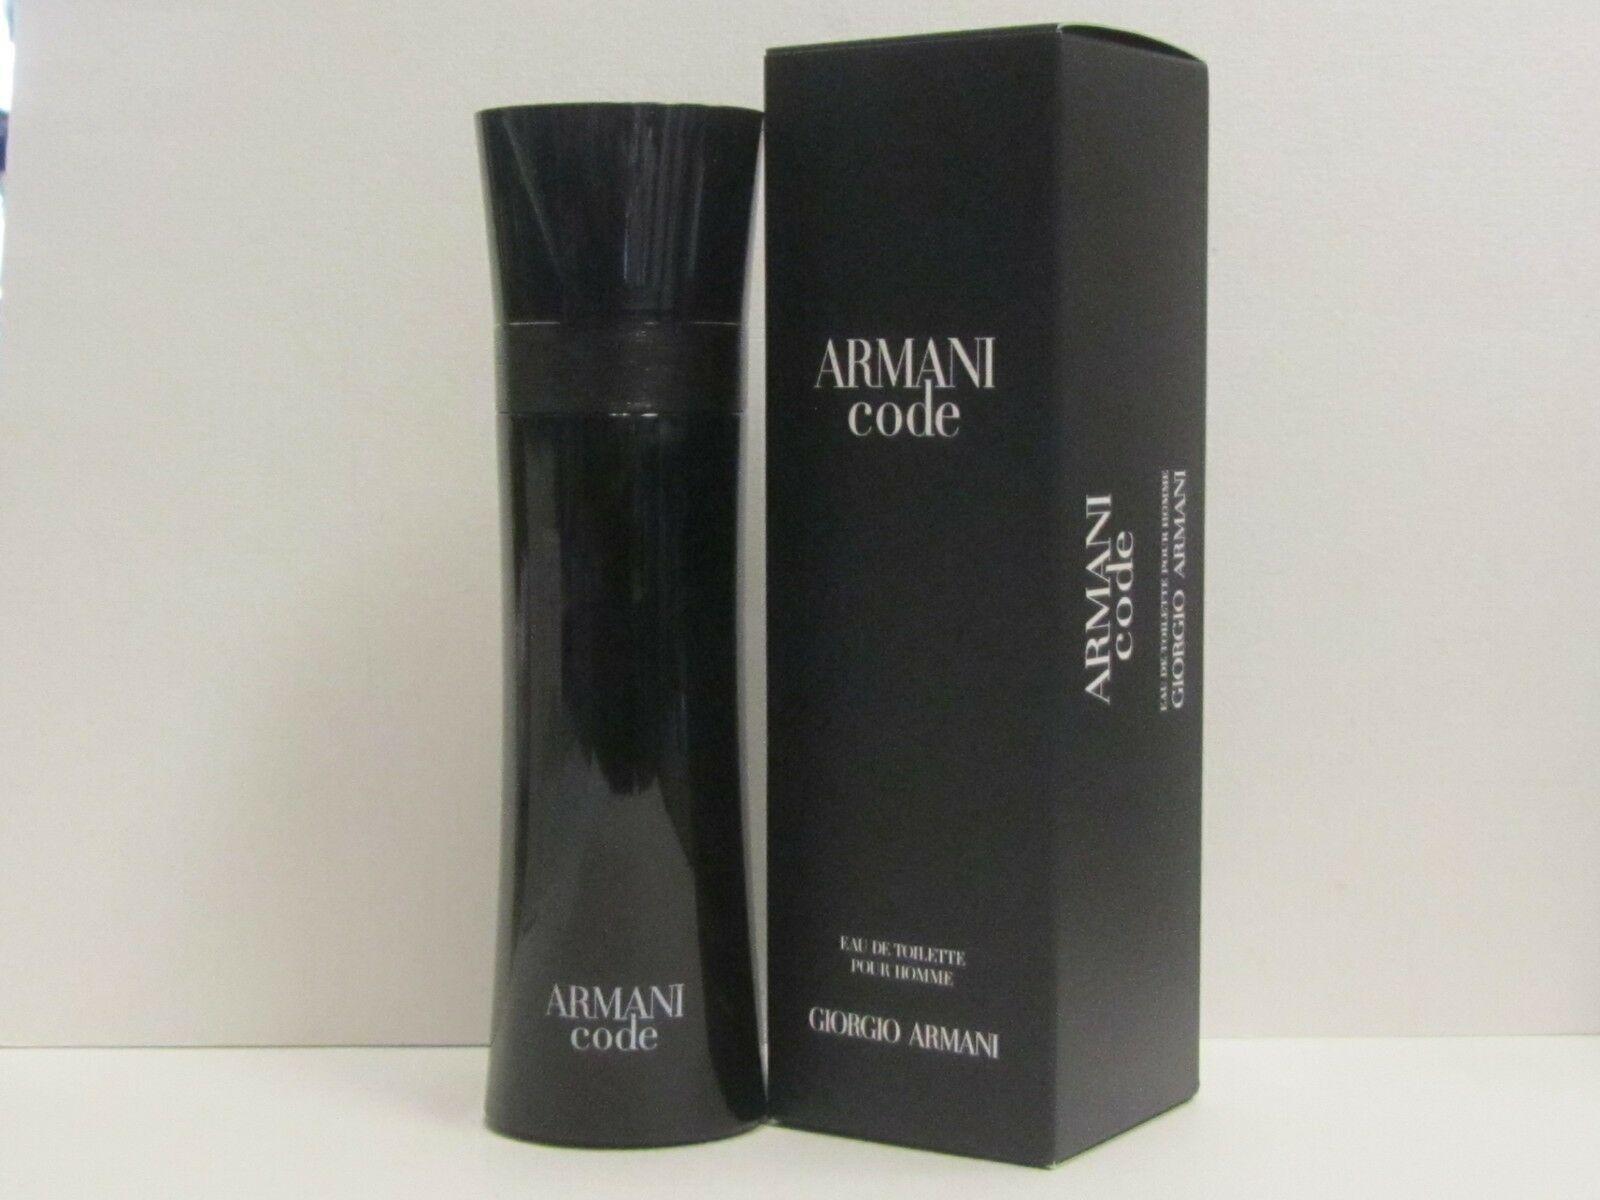 عطر ارماني كود الاصلي للرجال Armani Code Coding Armani